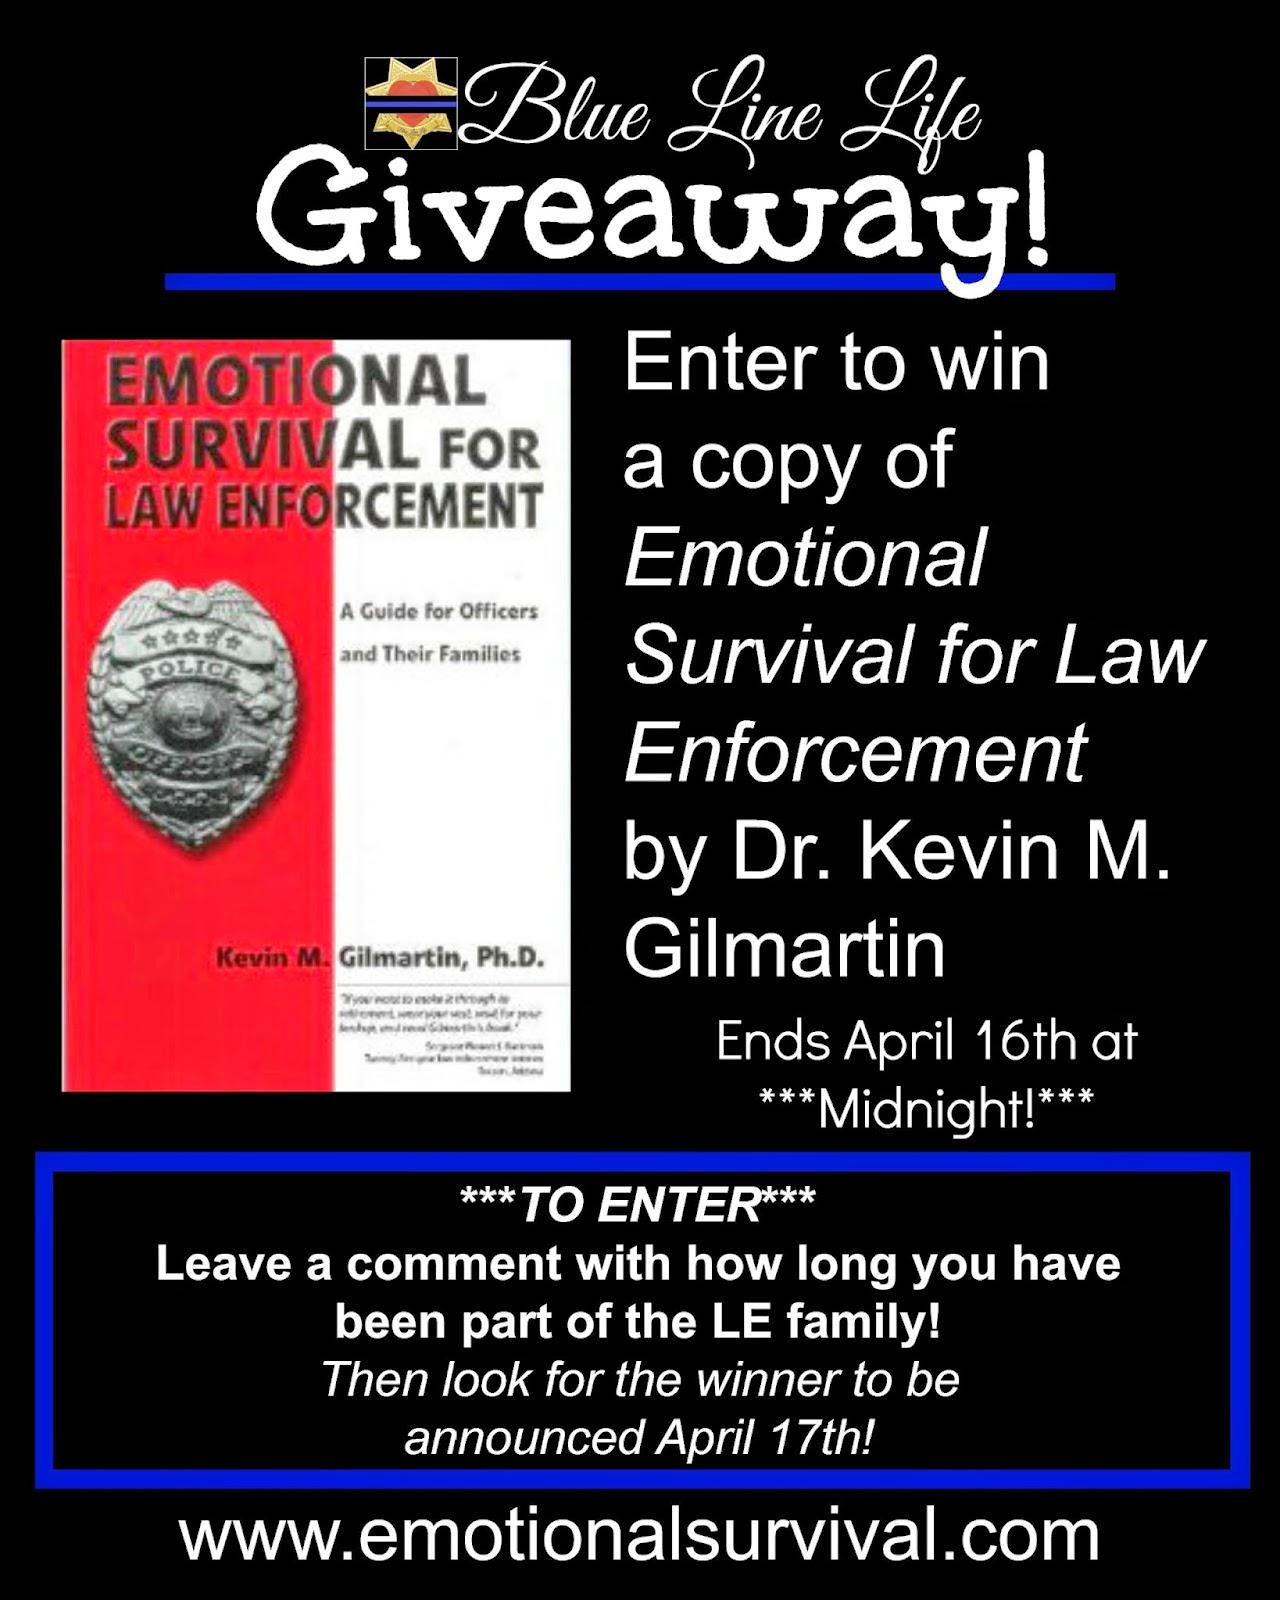 emotional survival for law enforcement 2